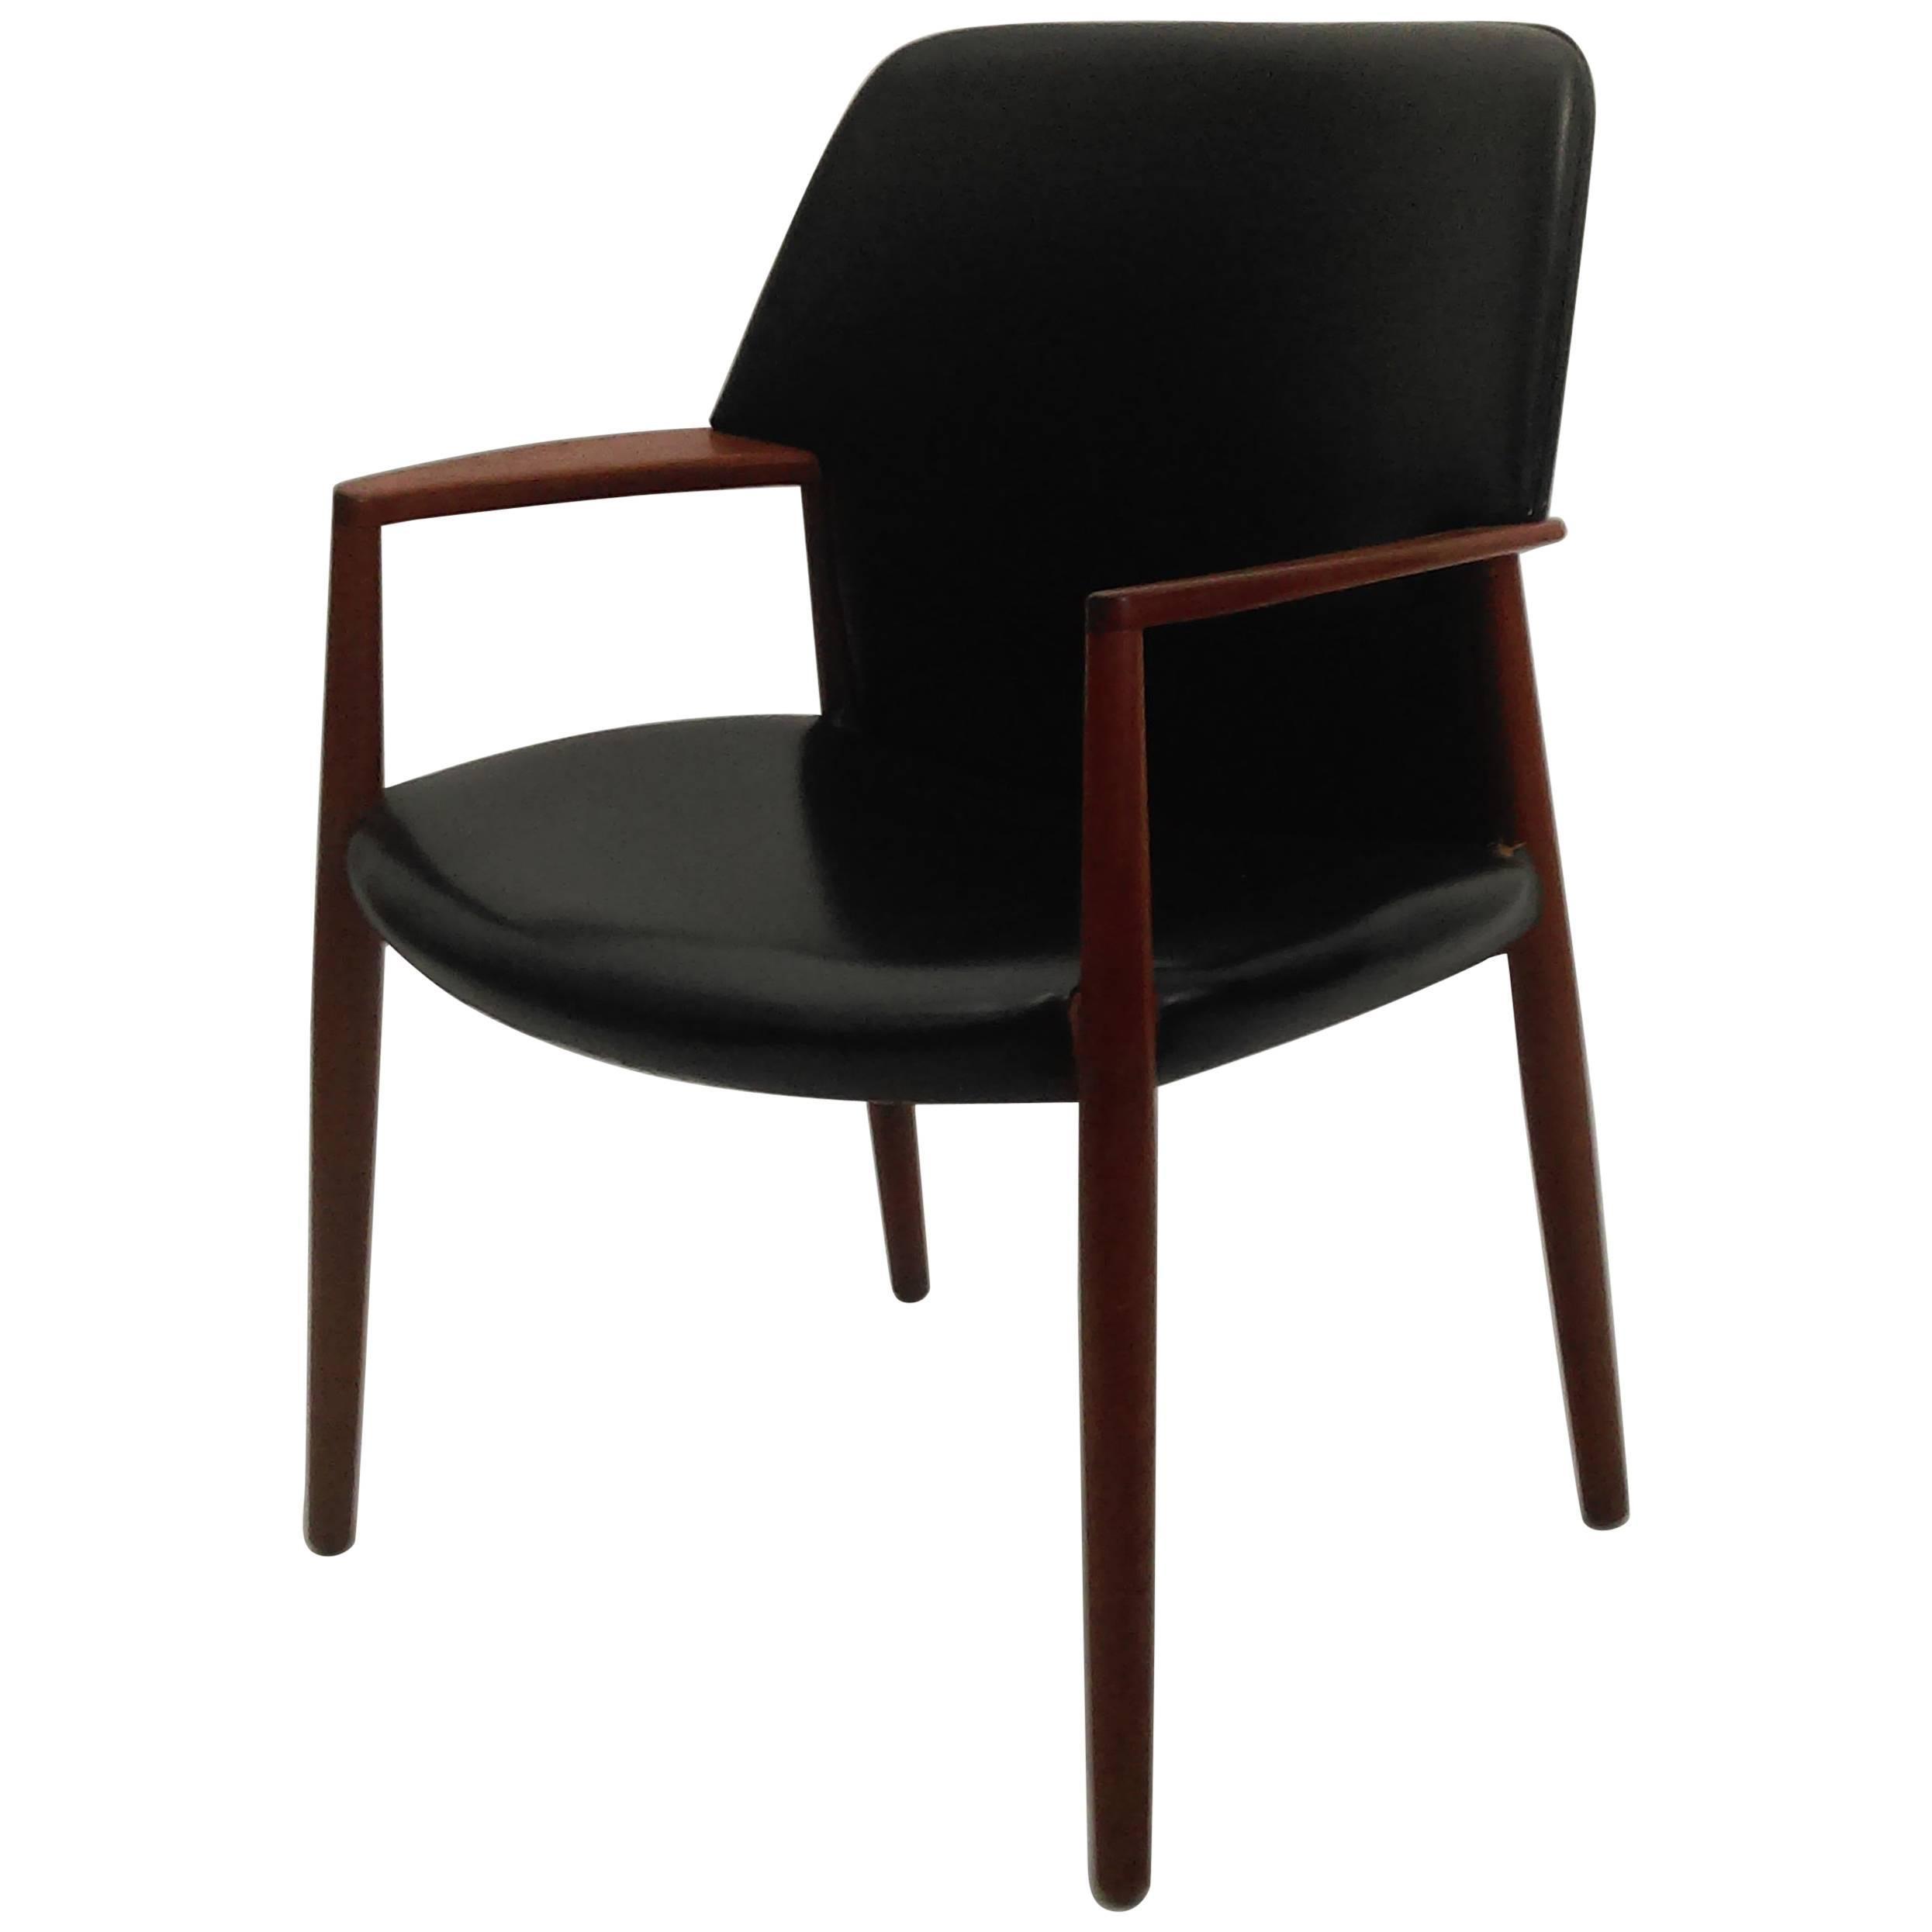 1950s Aksel Bender Madsen, Ejnar Larsen Armchair - Inc. Reupholstery